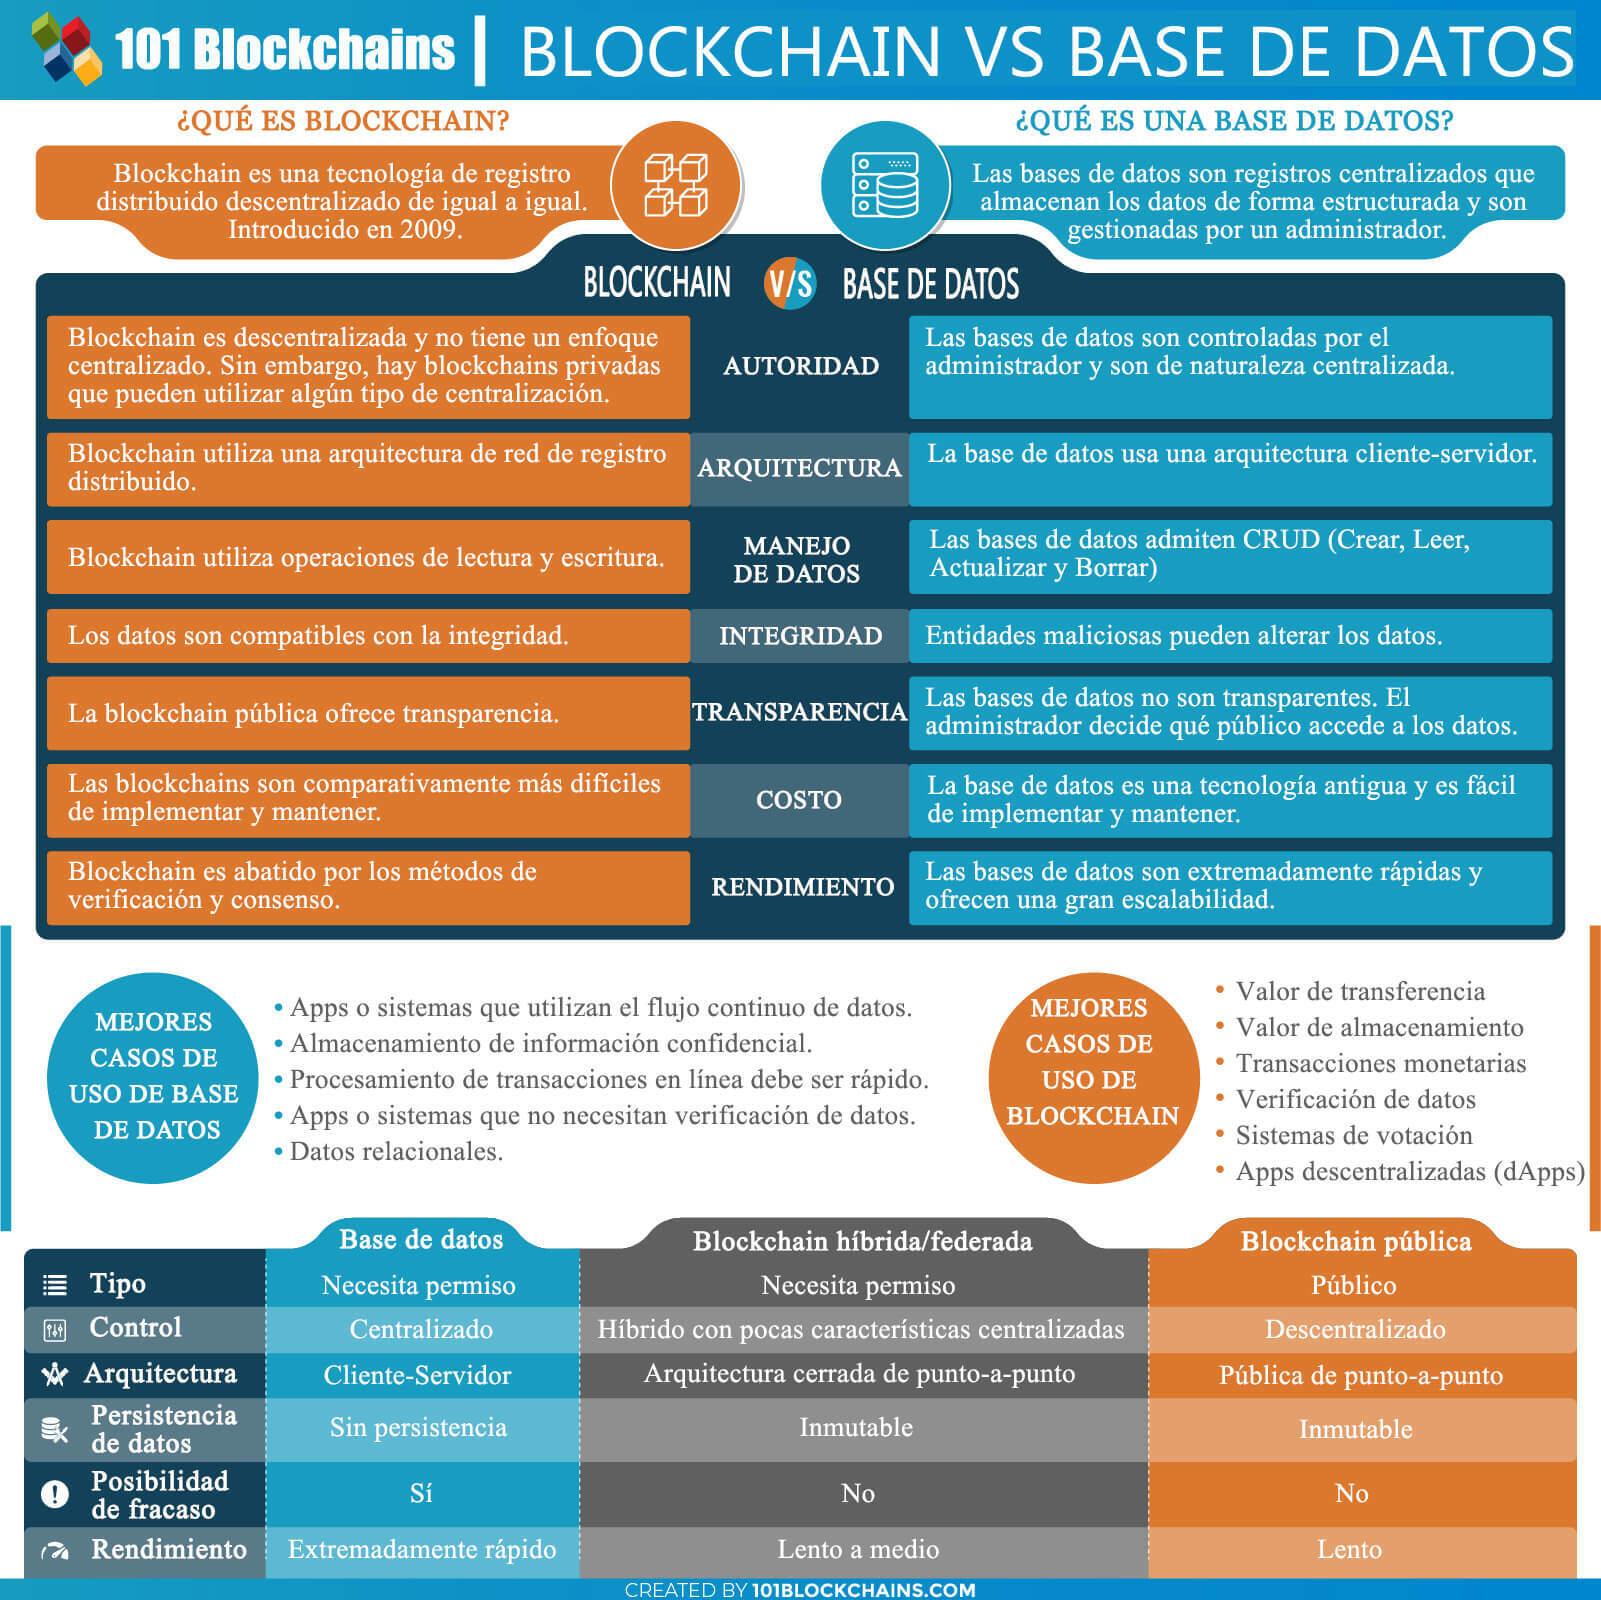 Blockchain vs. Base de datos